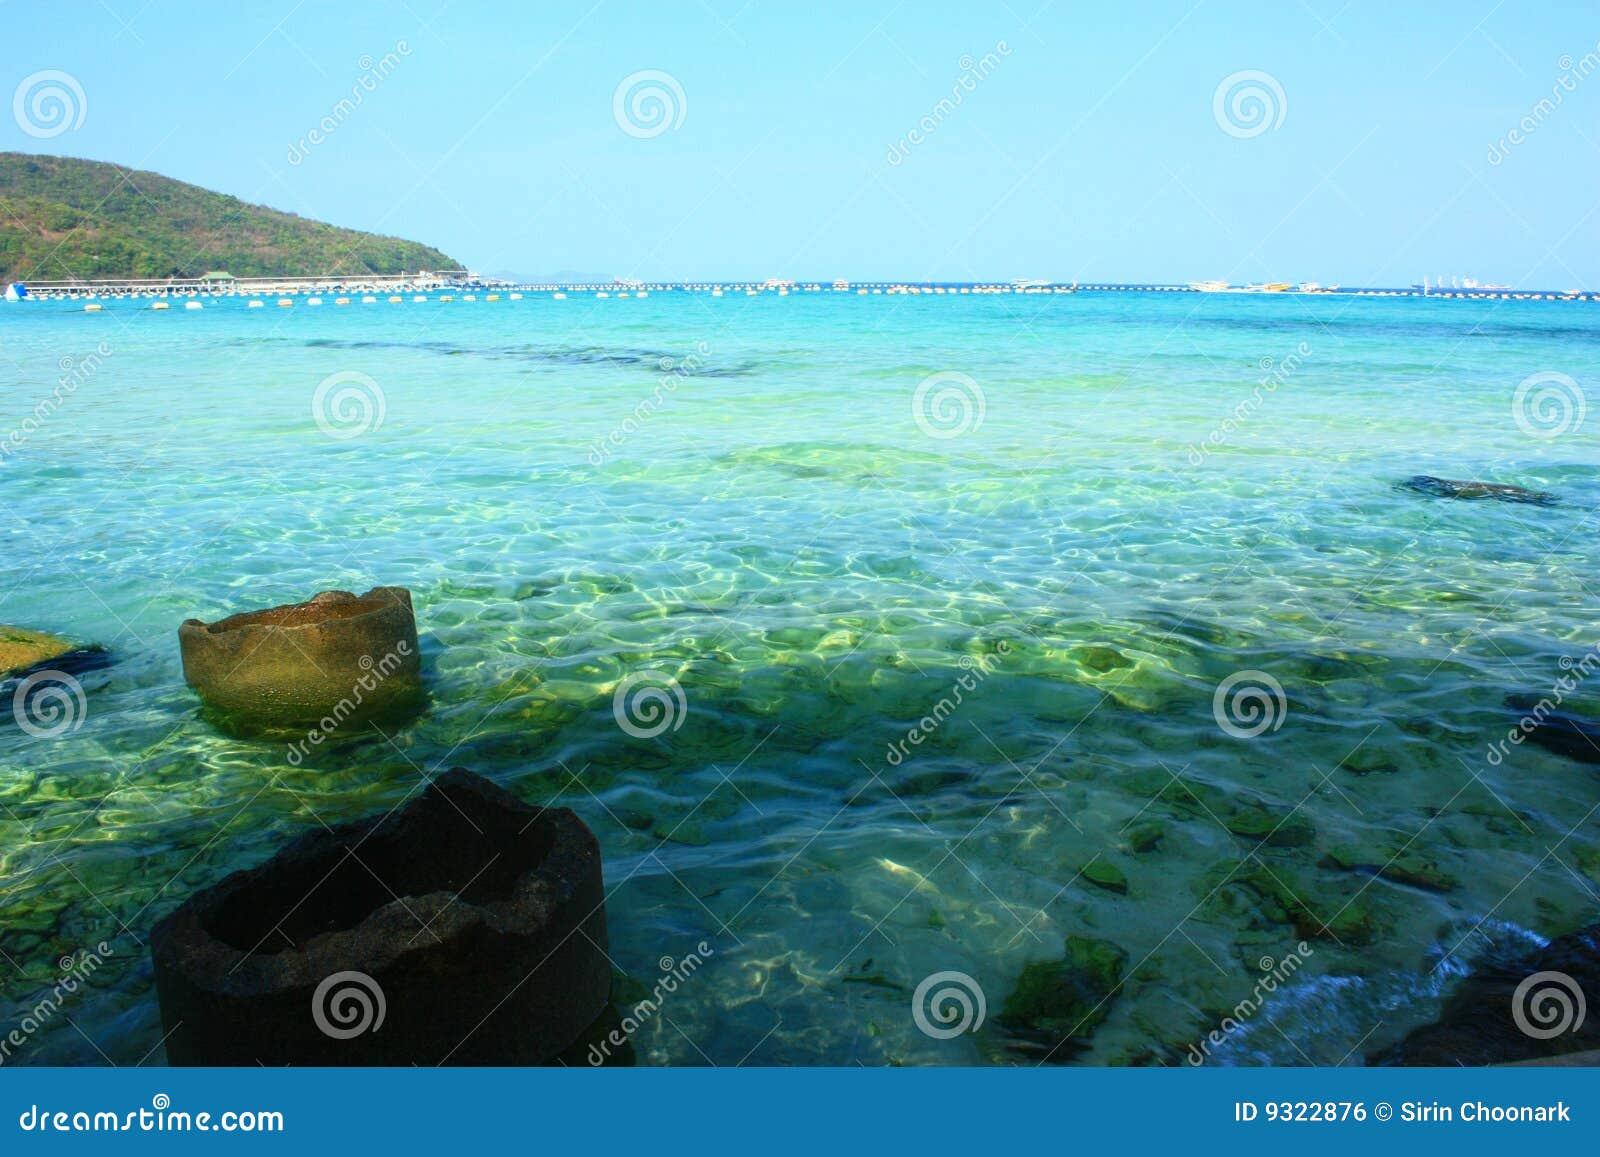 Tawean Beach Koh Larn Pattaya Chonburi Thailand Stock